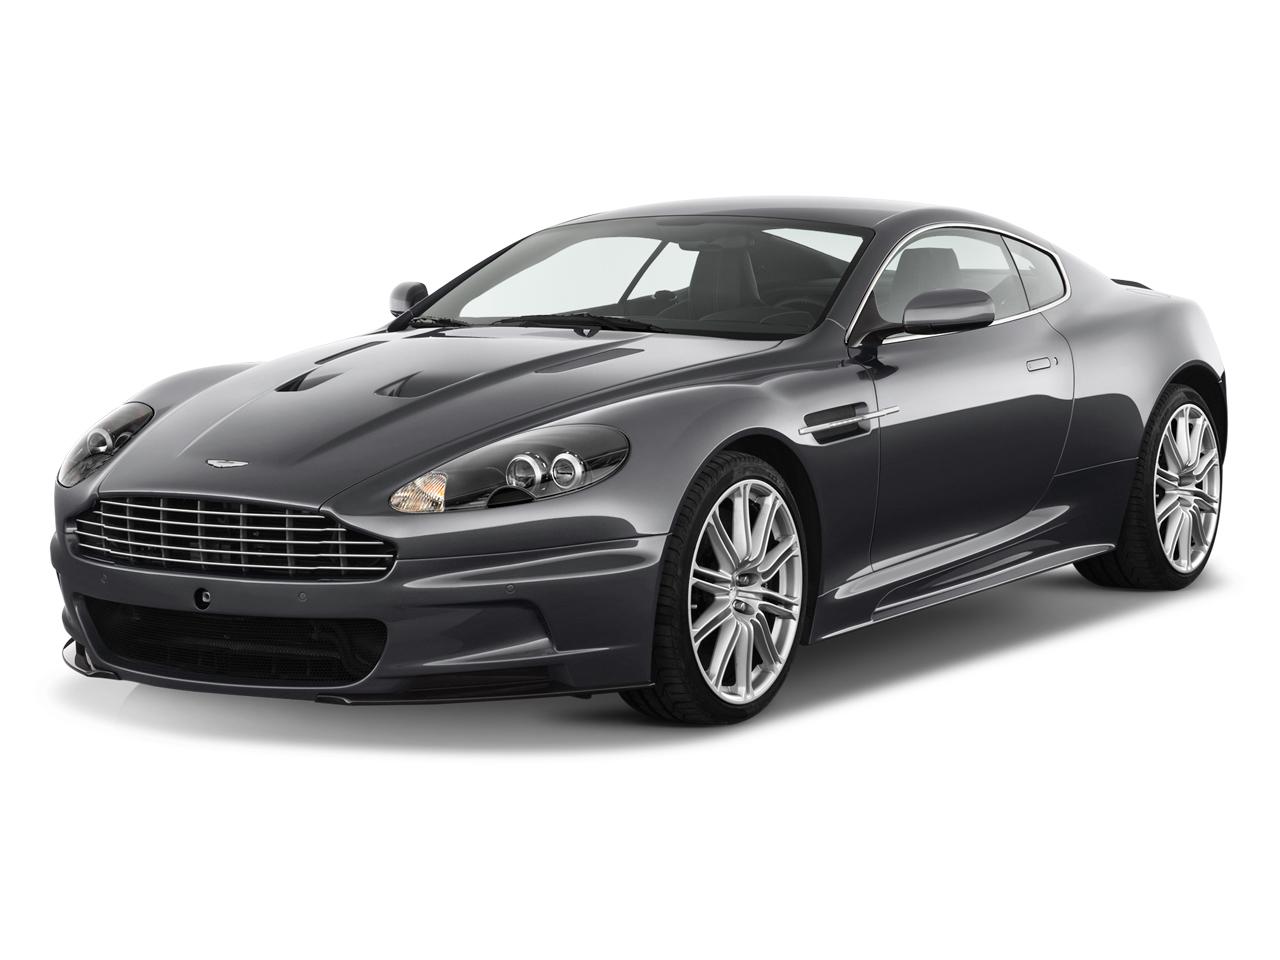 vehicles bond lifestyle - 636×309